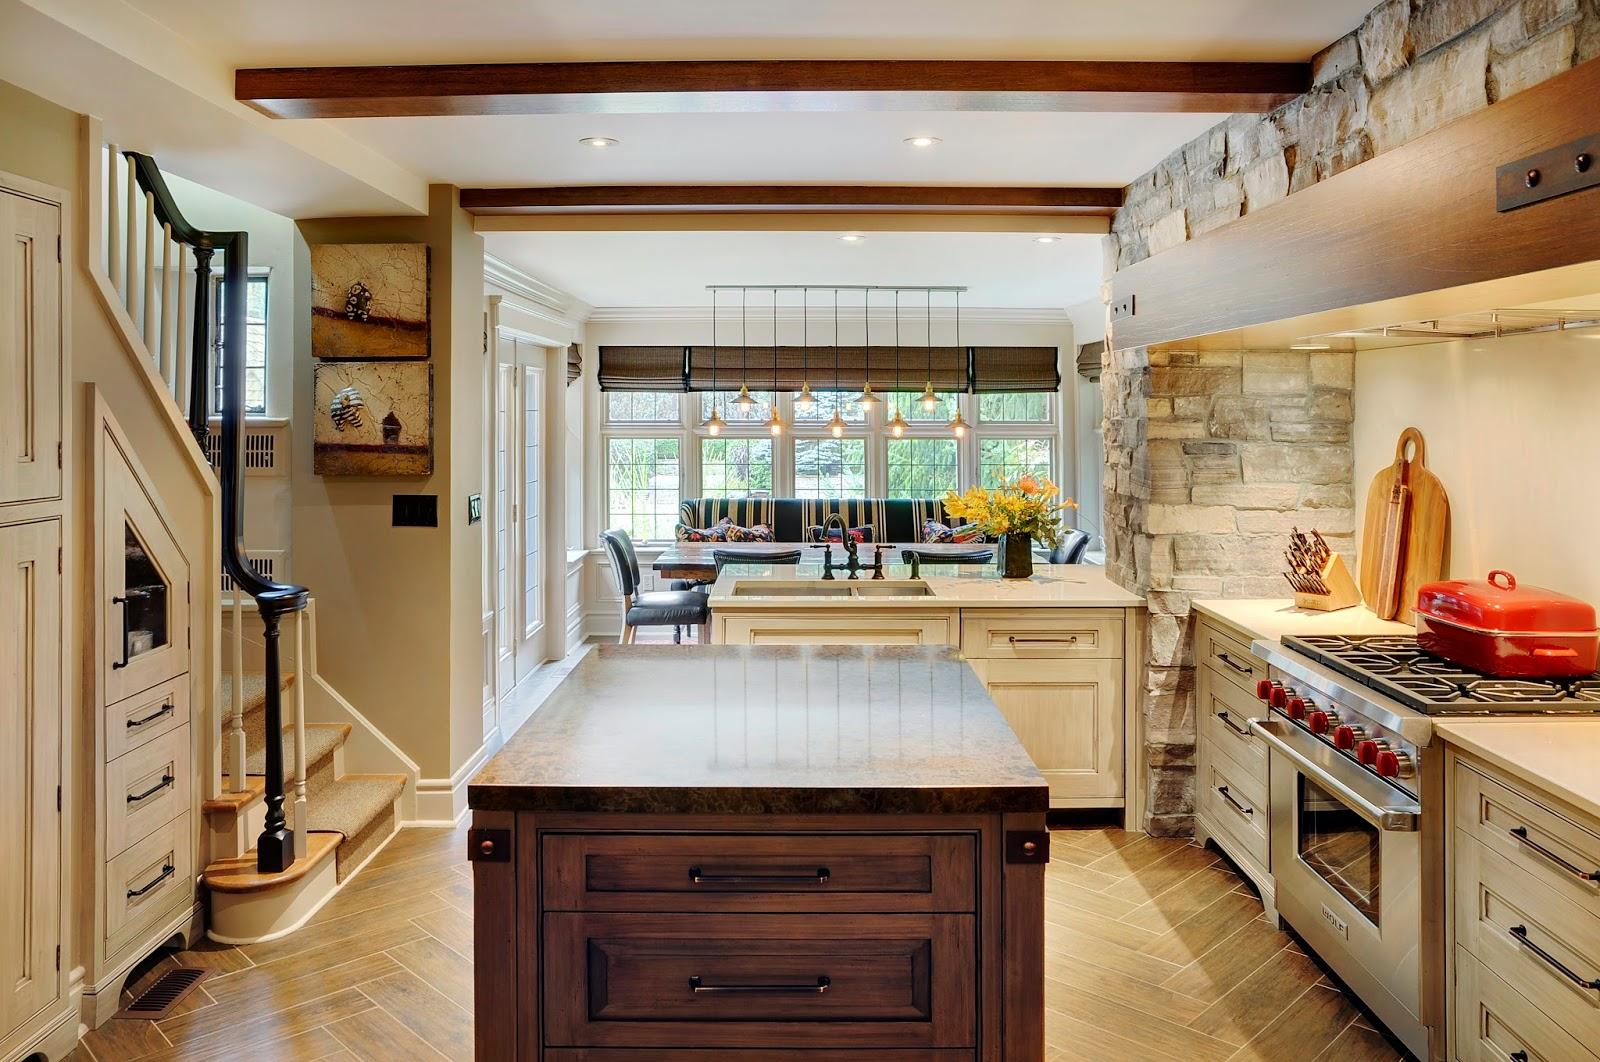 braams custom cabinets old world cabinets ellaloves